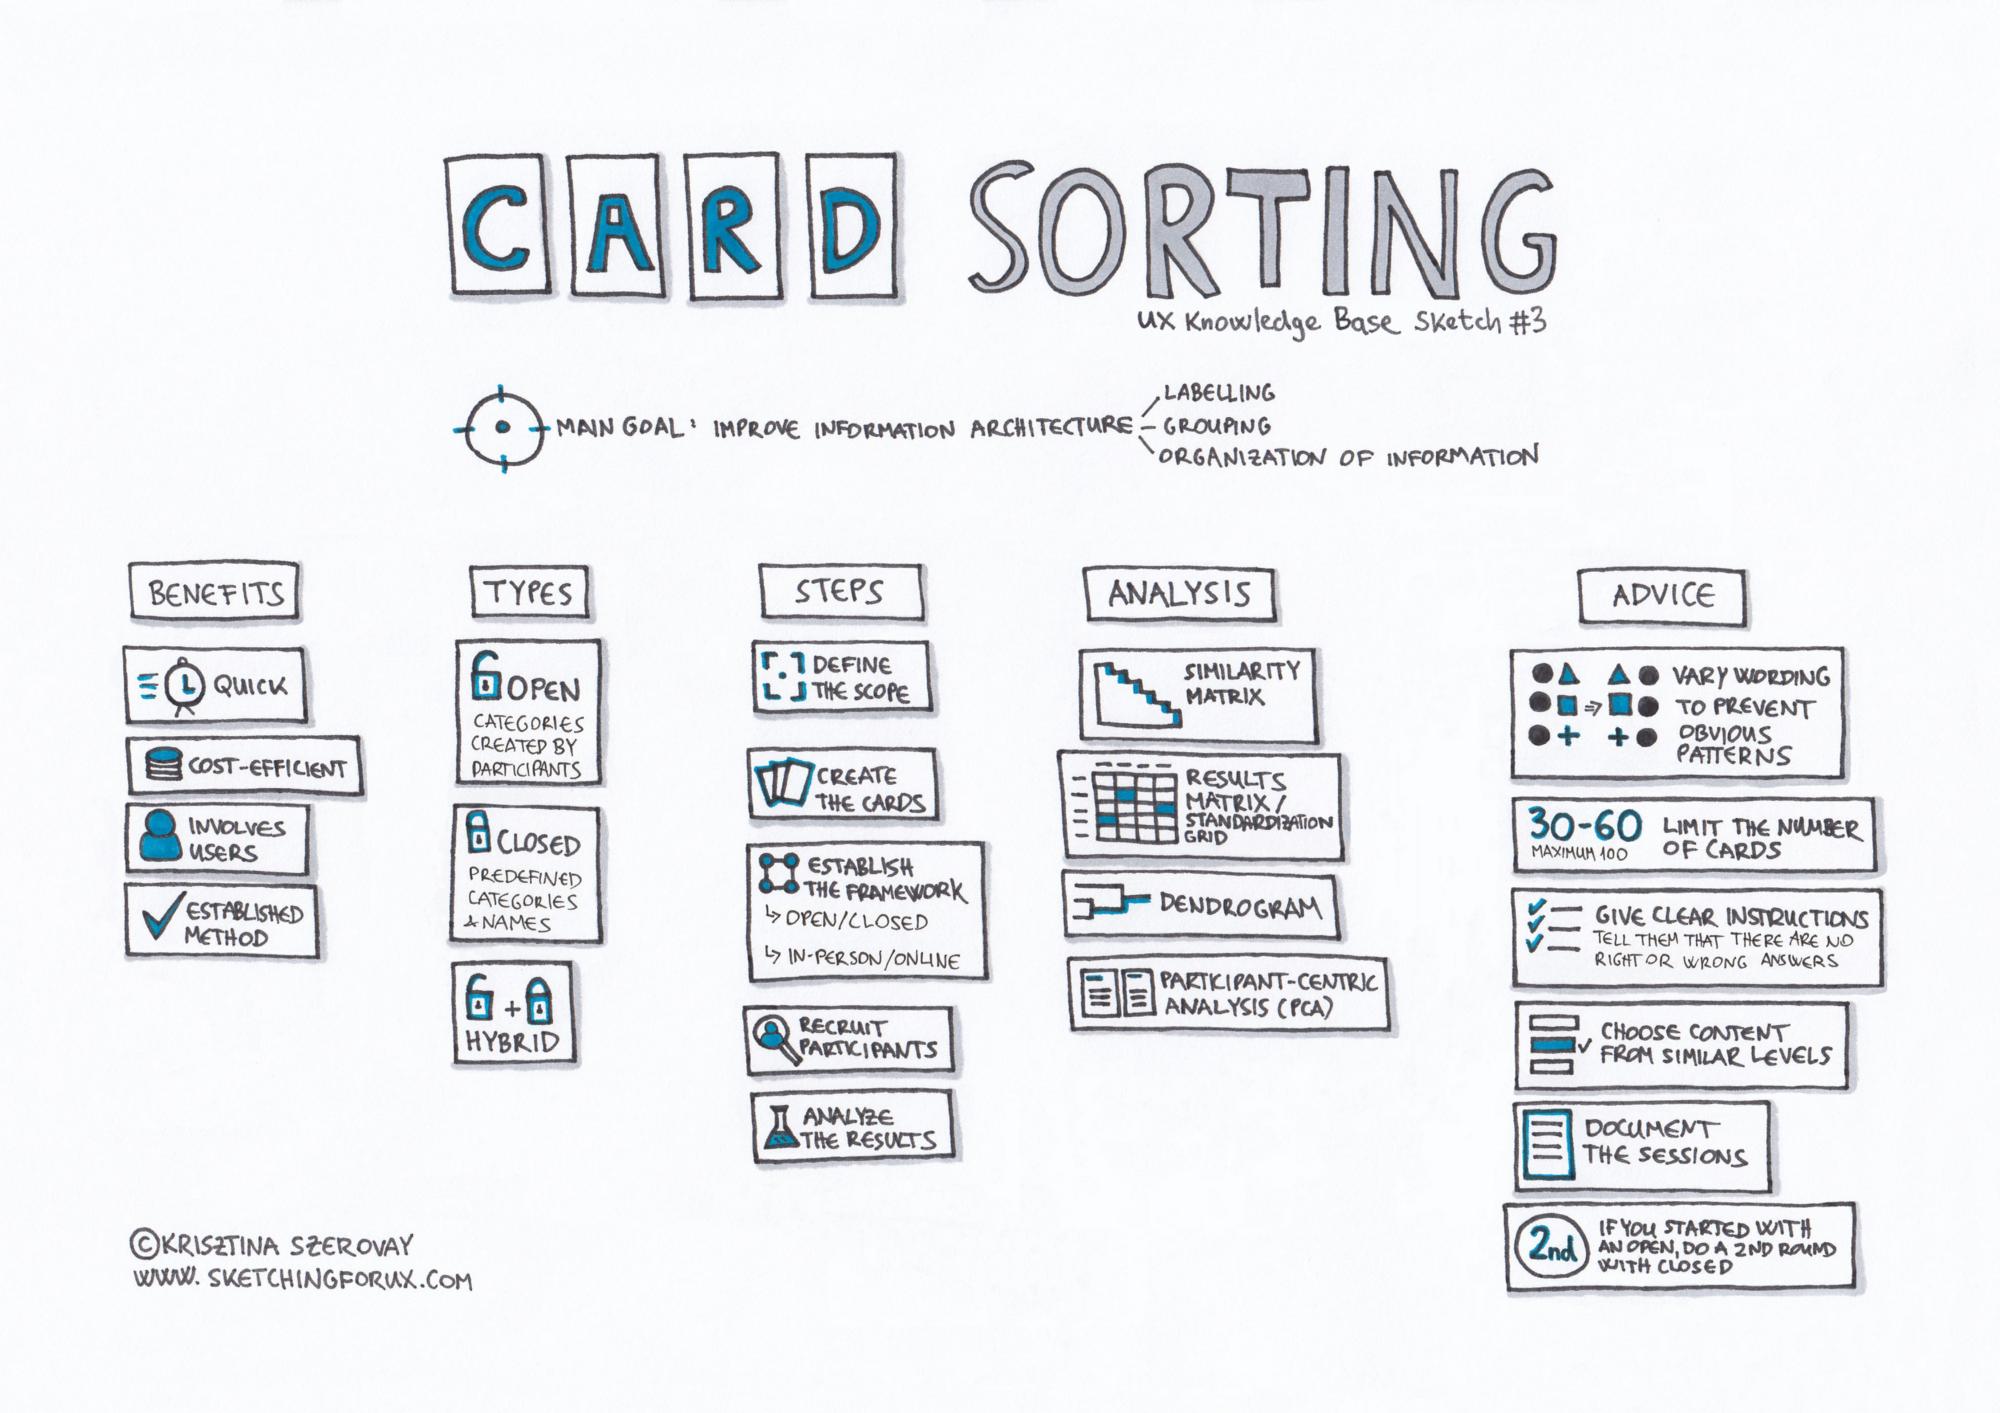 card sorting illustration